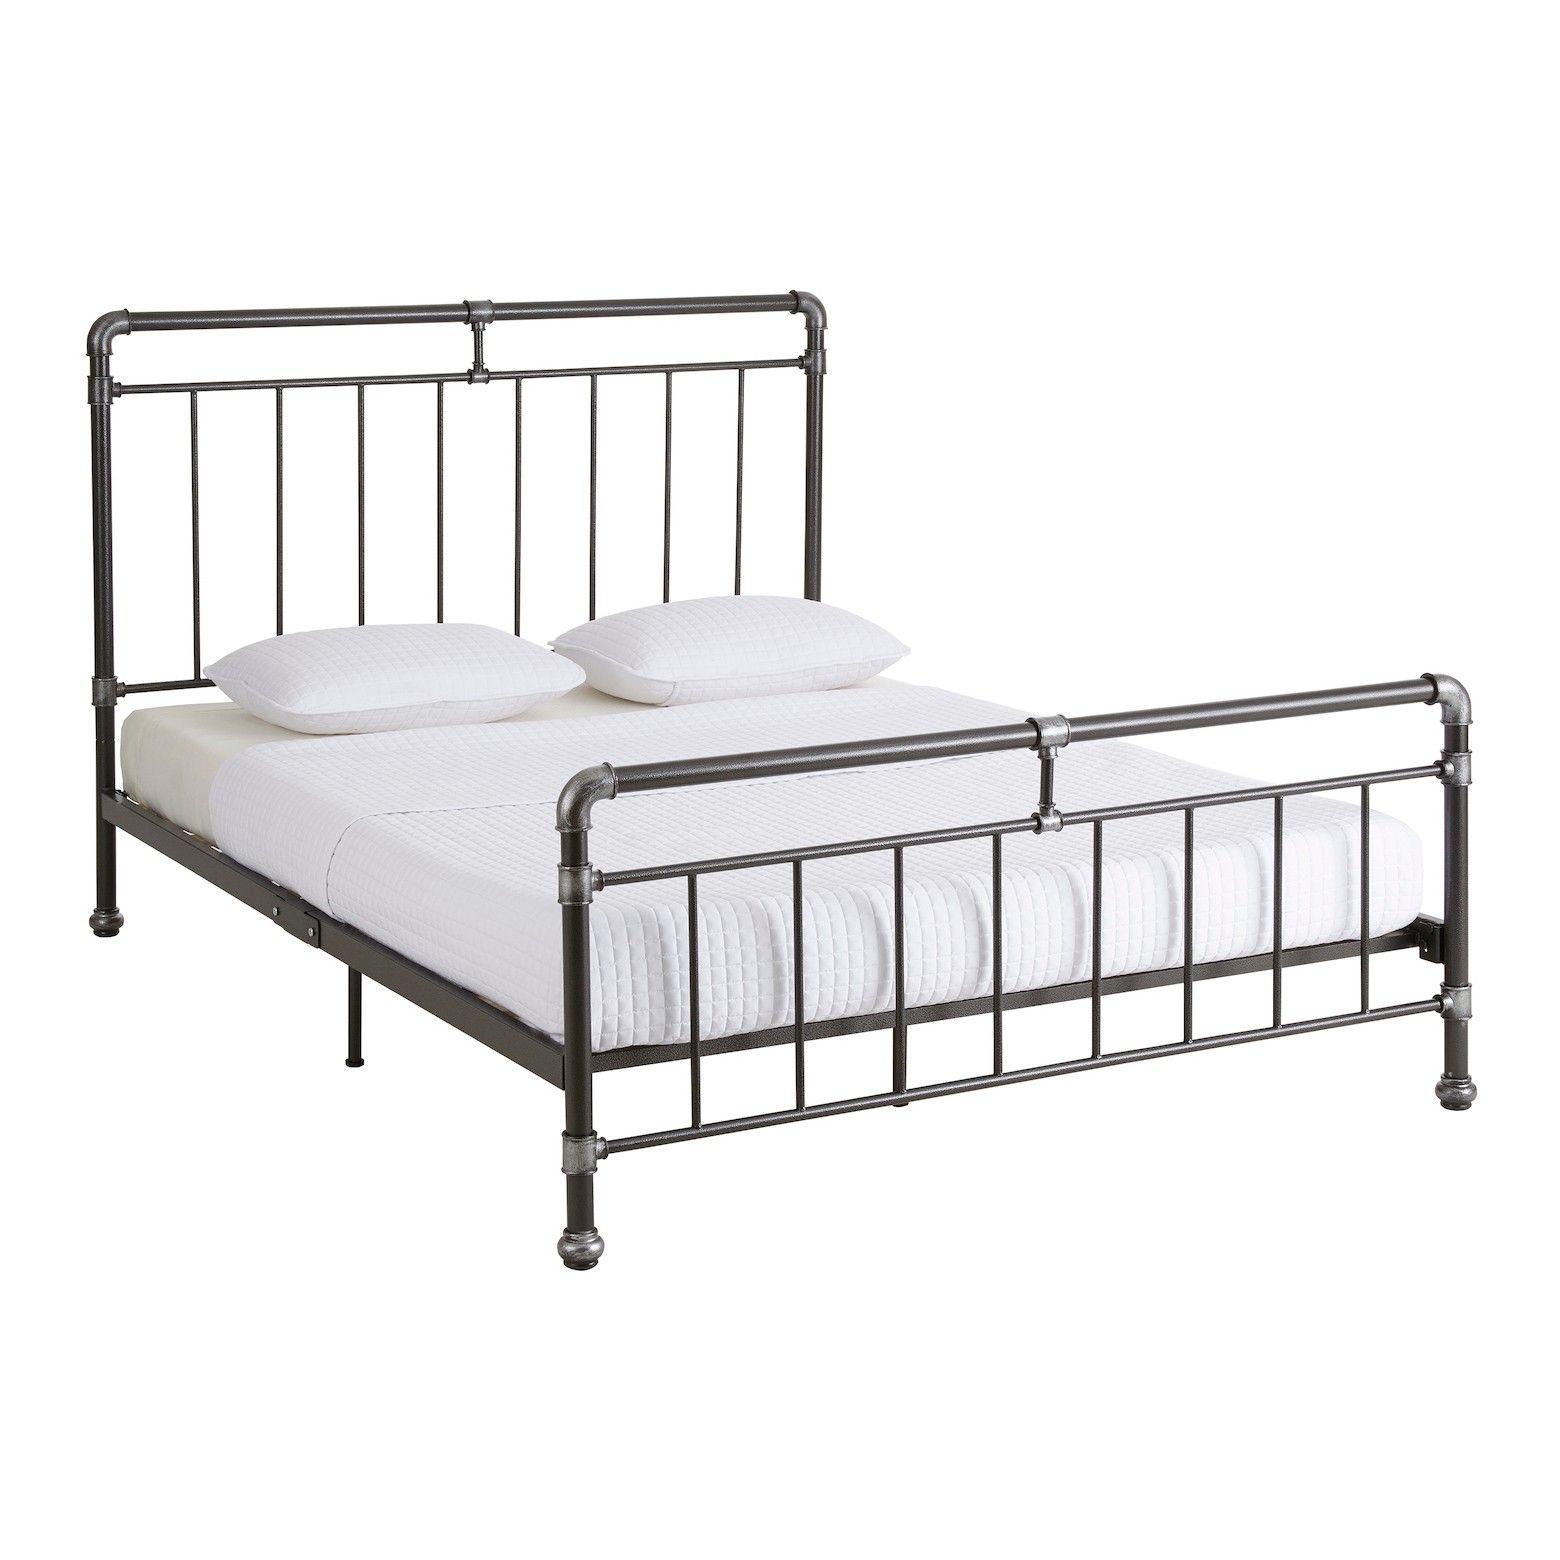 This Stunning Metal Platform Bed Frame Is Evocative Of Old World